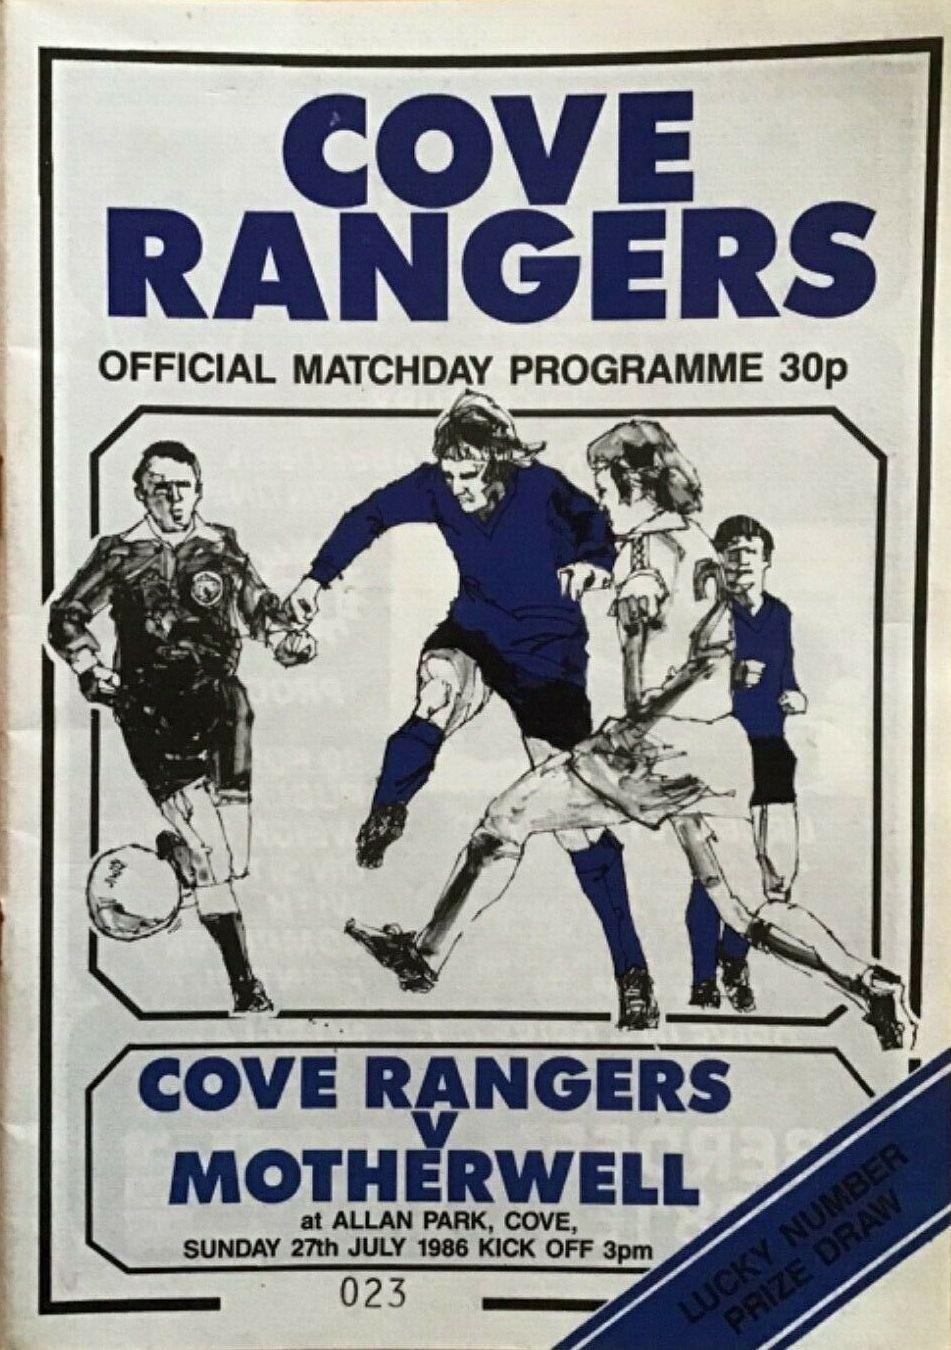 versus Cove Rangers Programme Cover